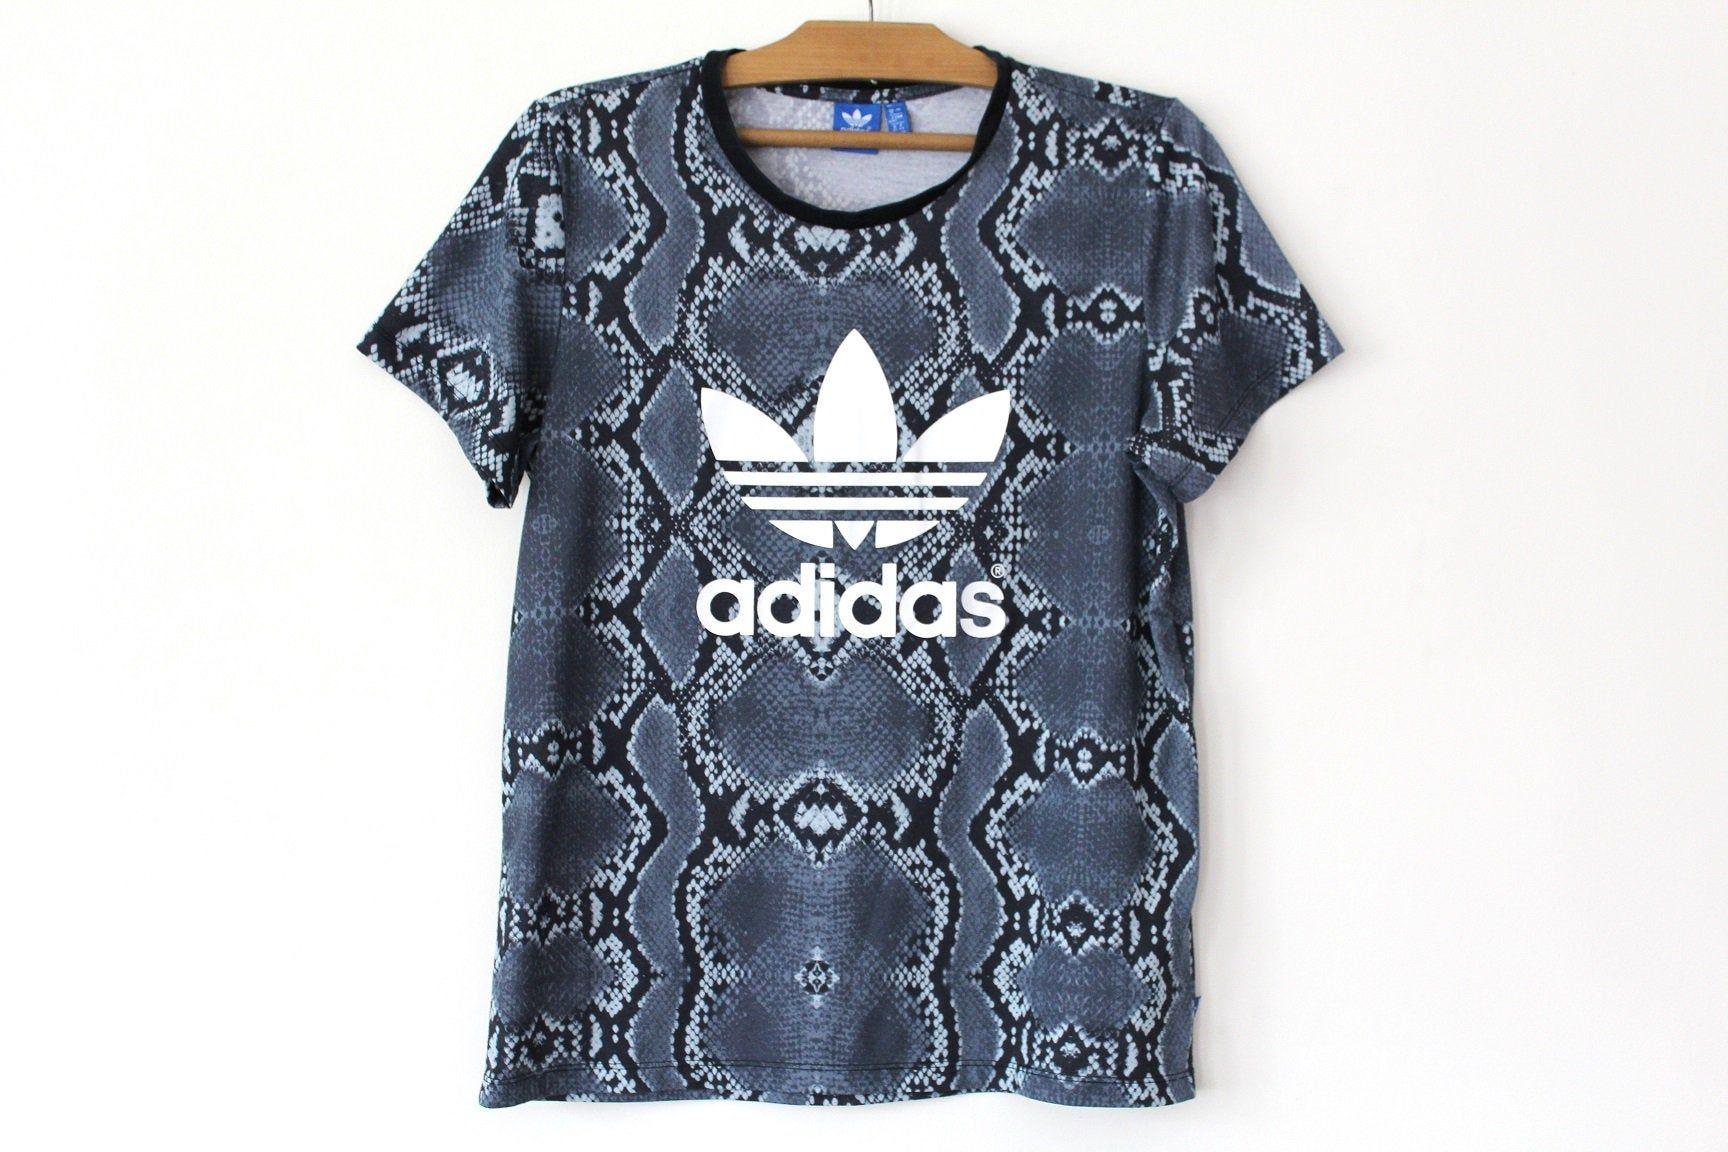 90 S Adidas T Shirt Vintage Adidas Trefoil Shirt Hip Hop Etsy Vintage Adidas Adidas Sweatshirt Adidas Trefoil [ 1152 x 1728 Pixel ]